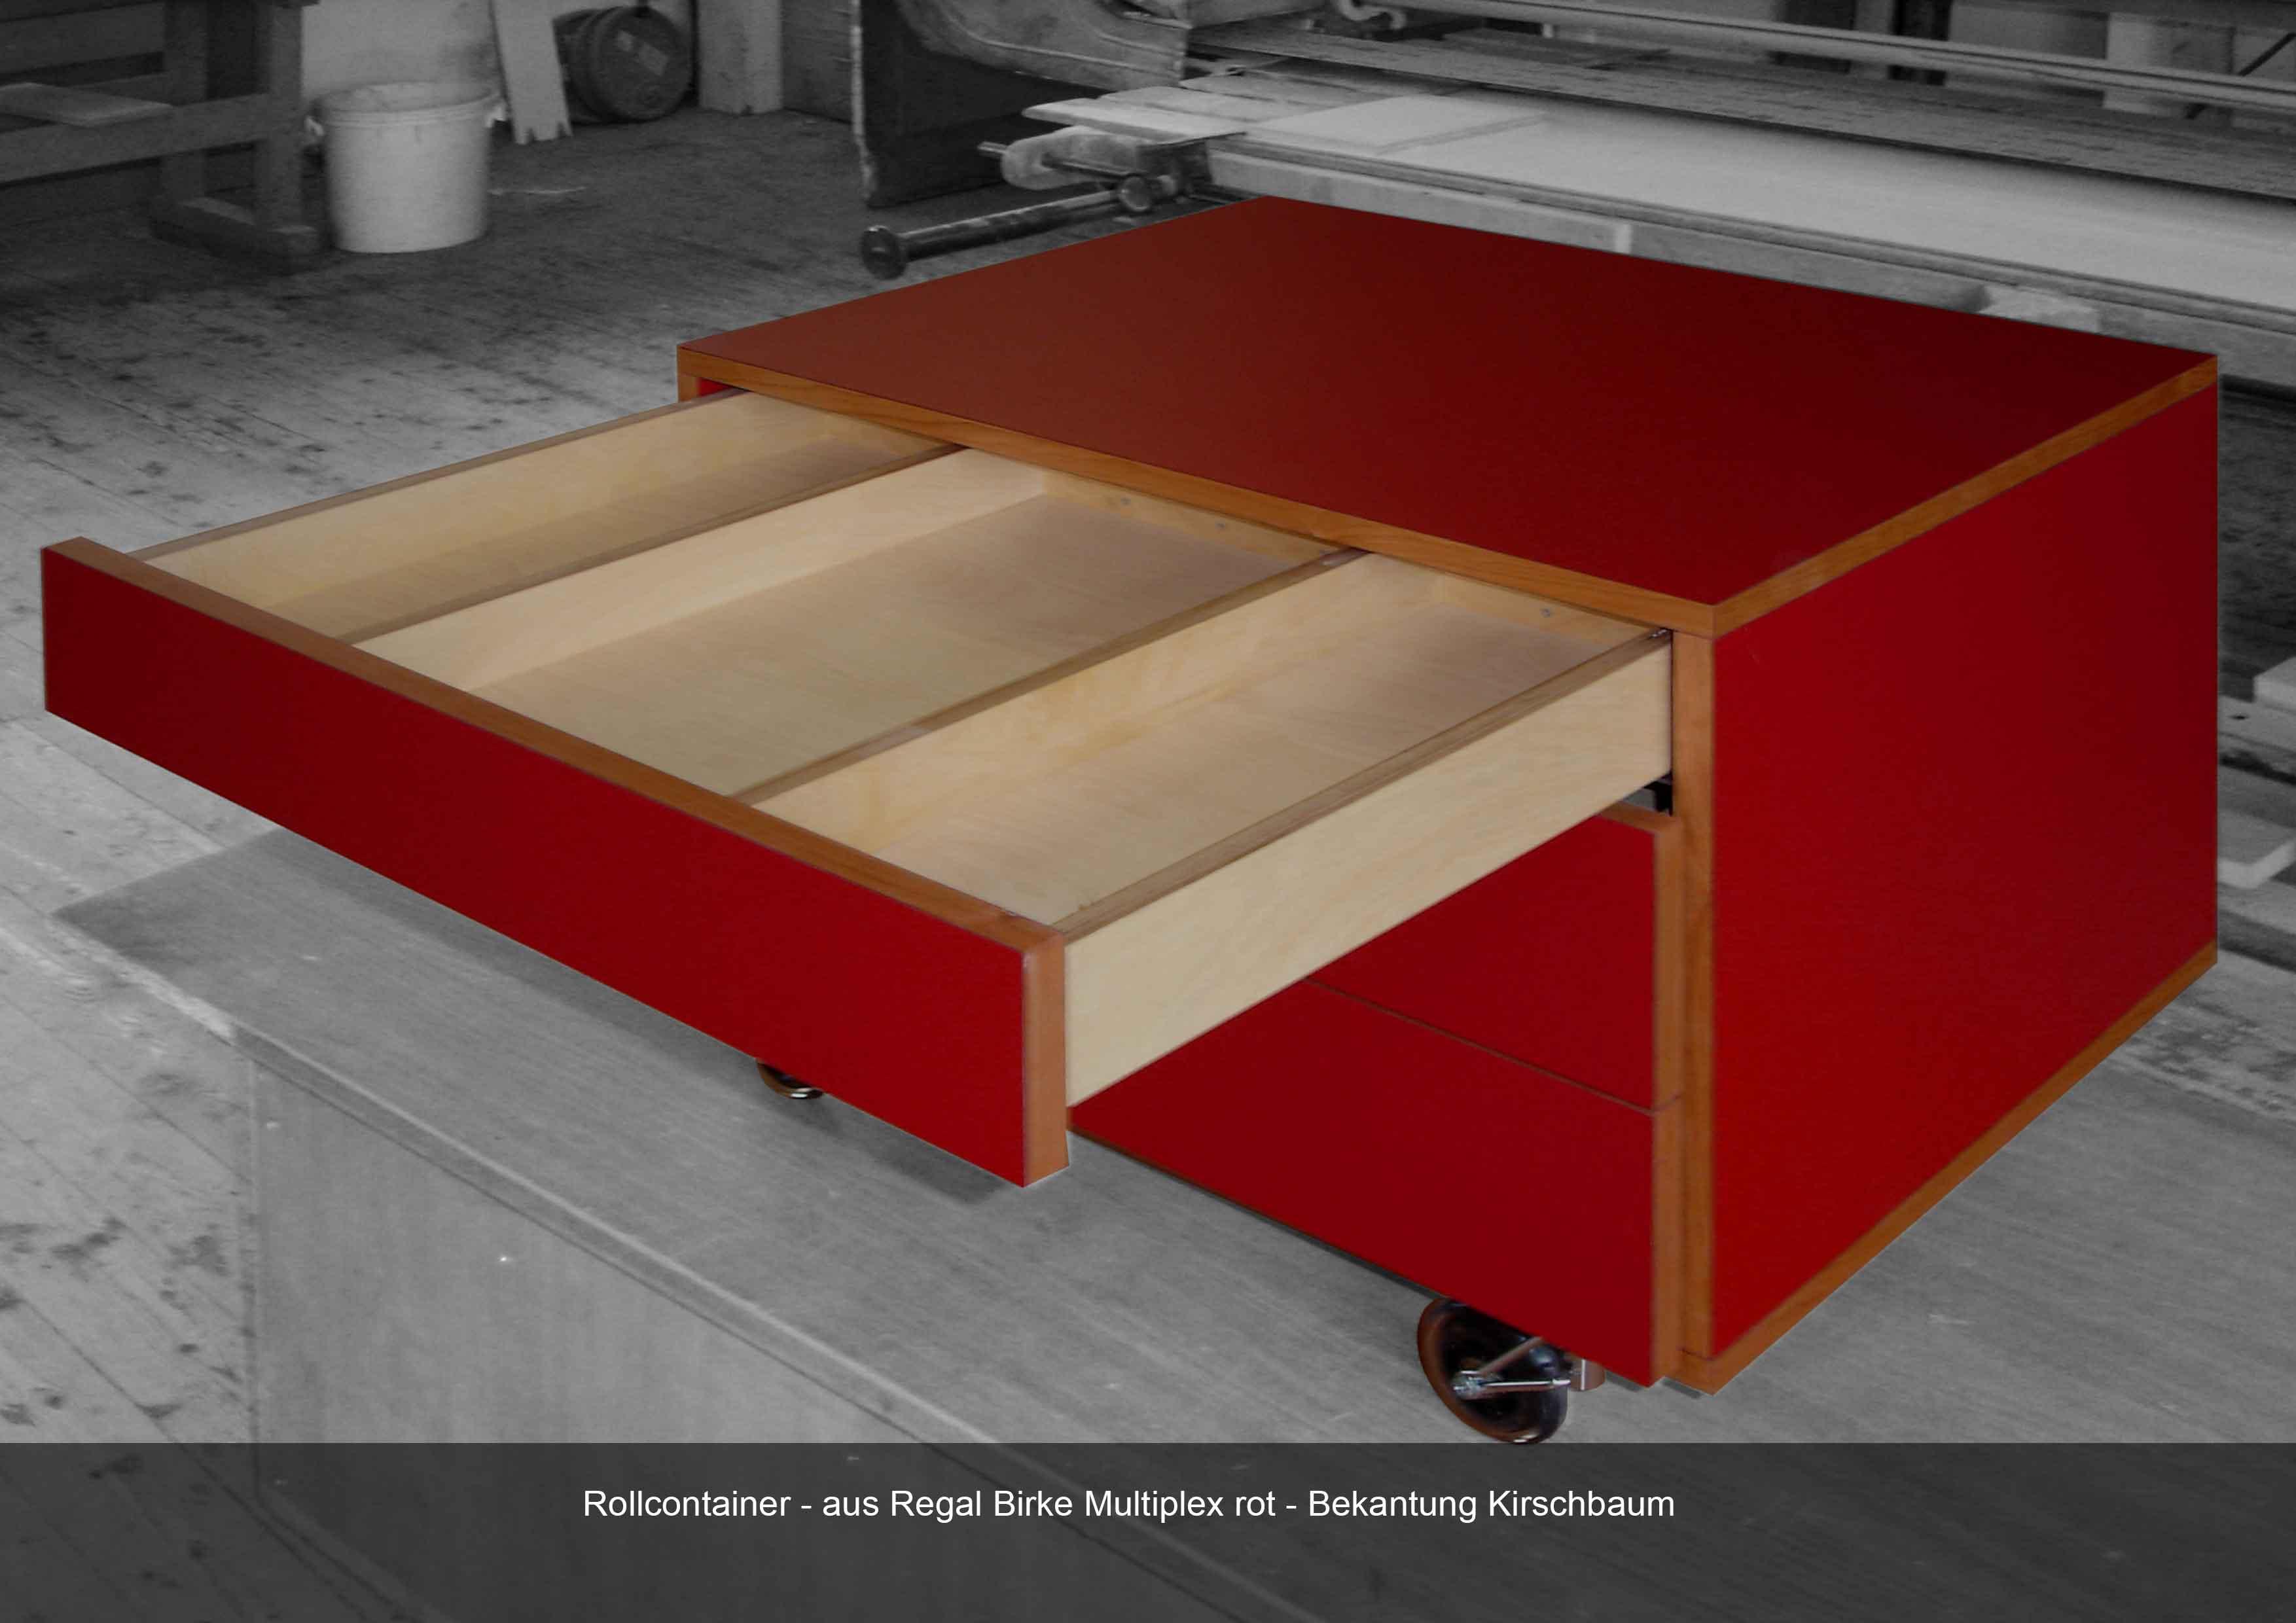 Schriebcontainer in Birke Multiplex rot belegt